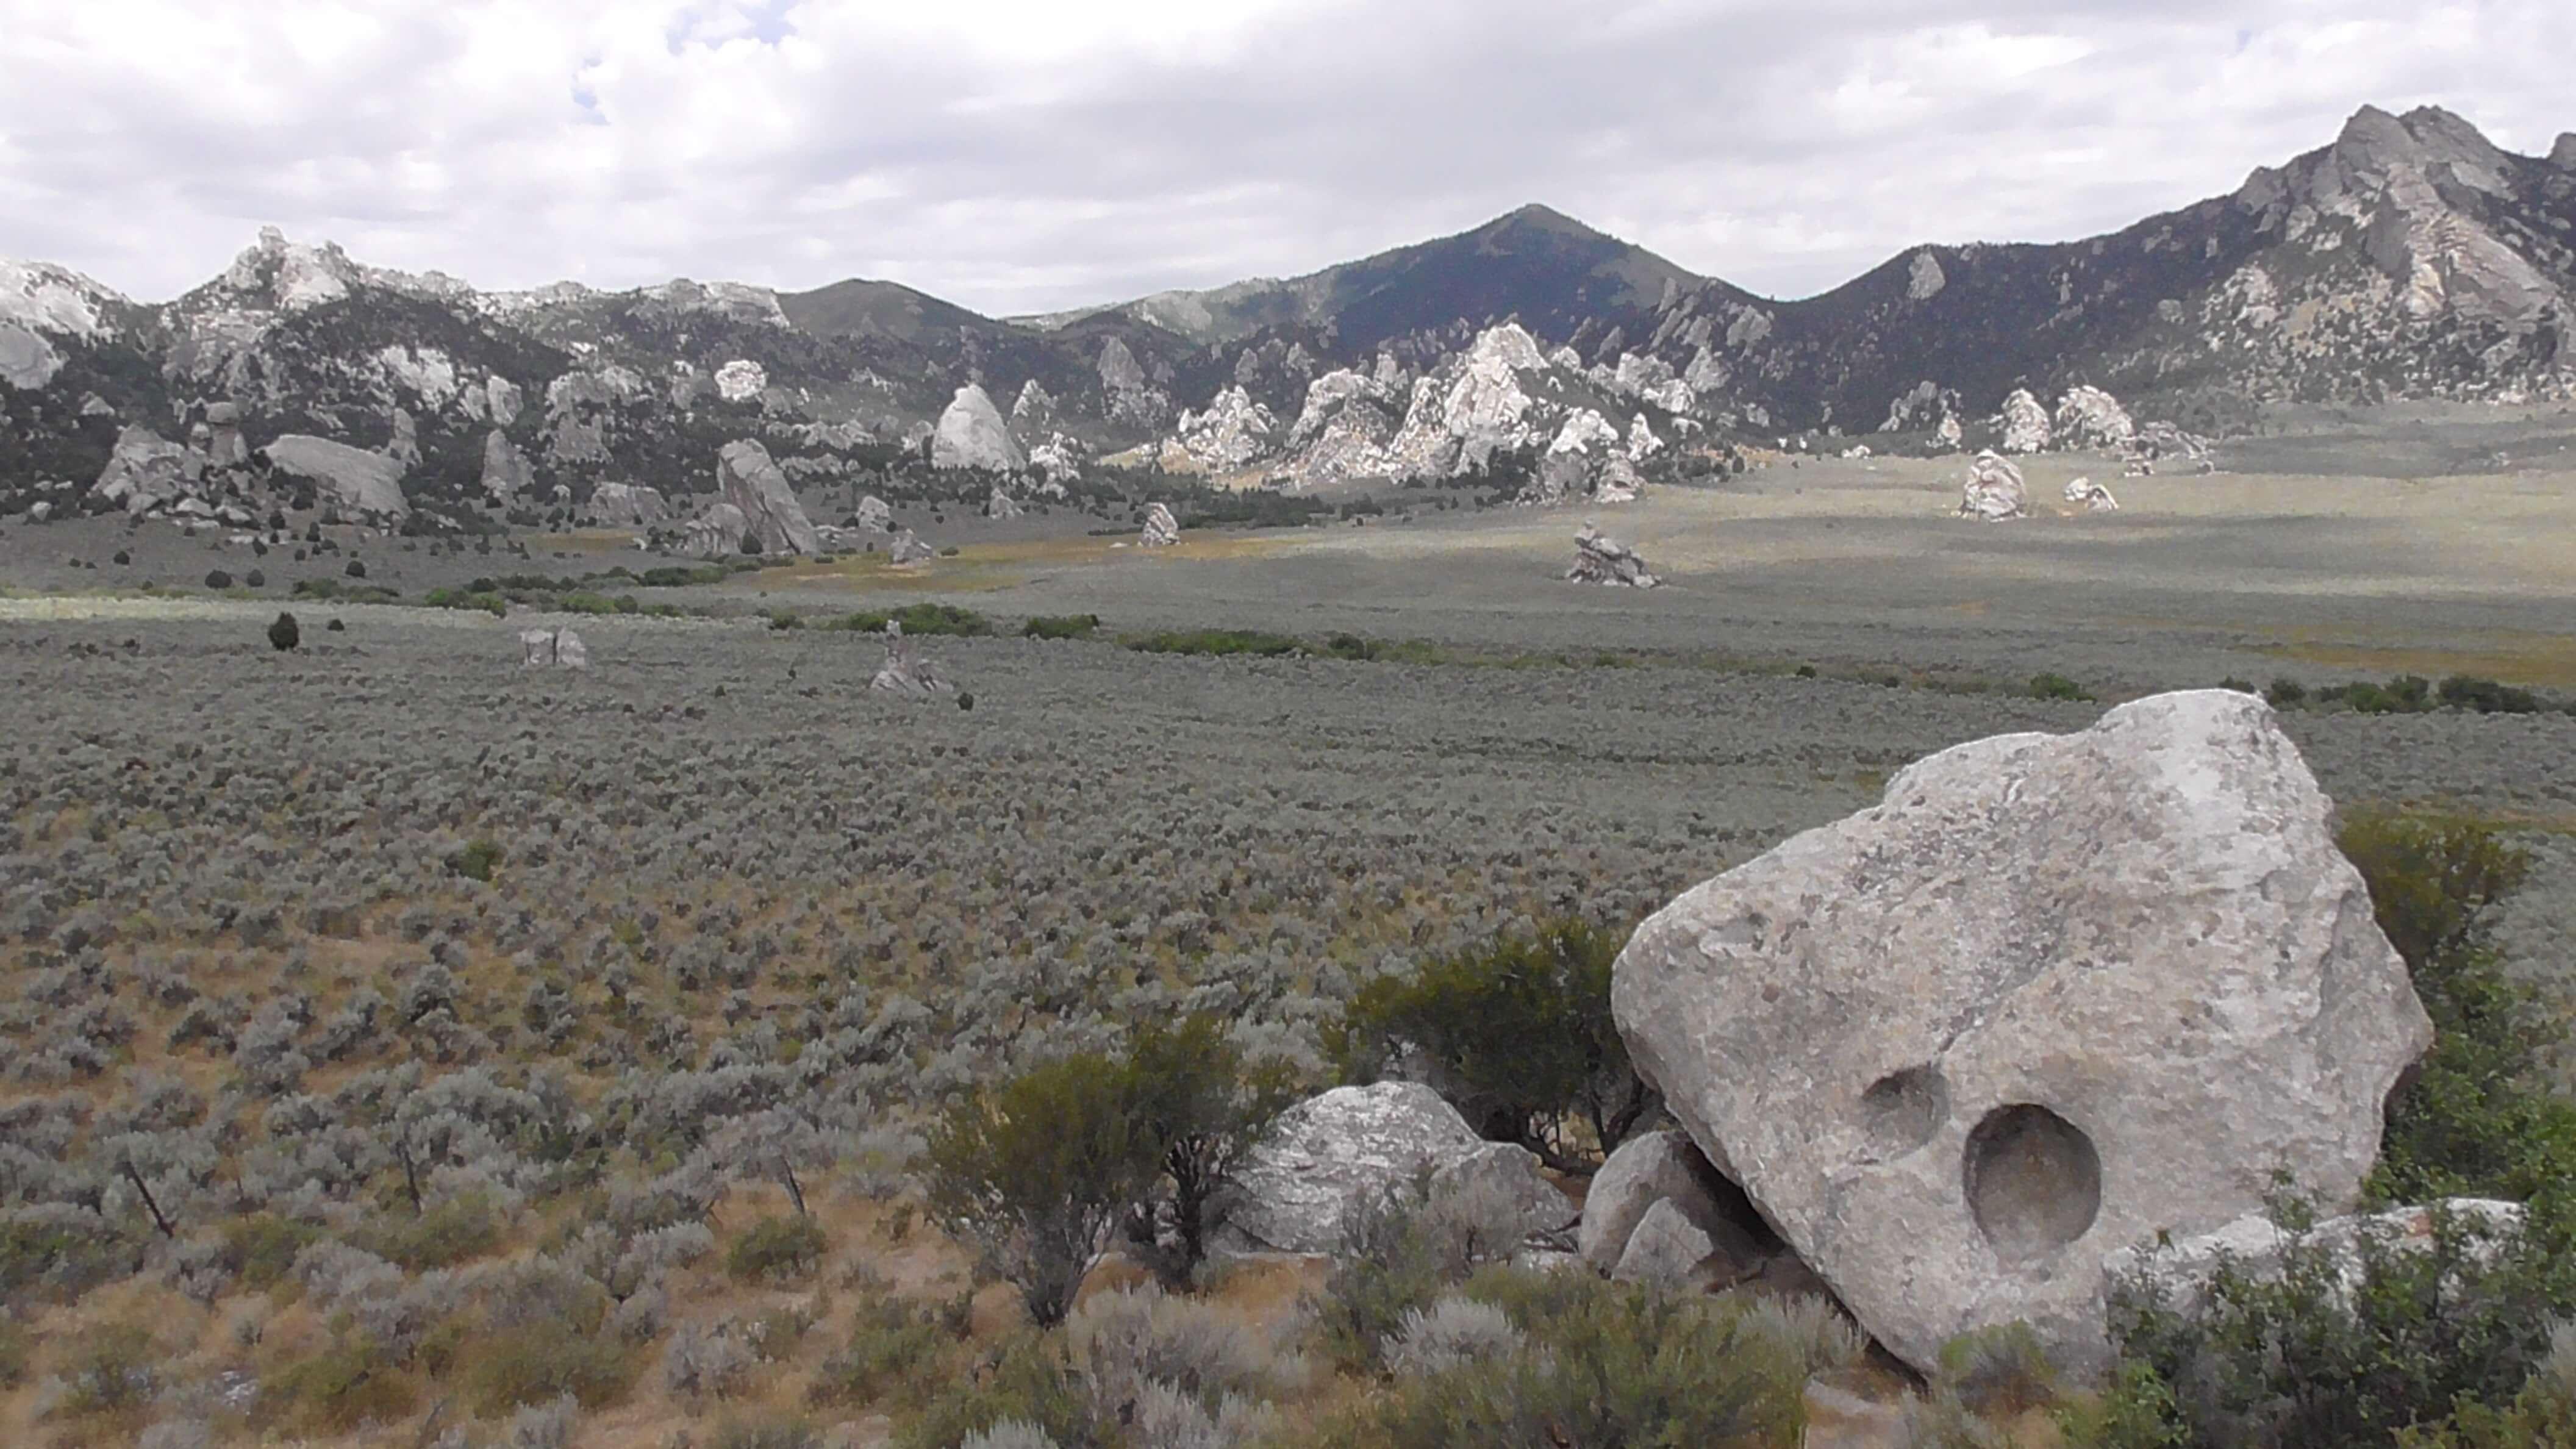 Taffoni, City of Rocks National Reserve, Idaho